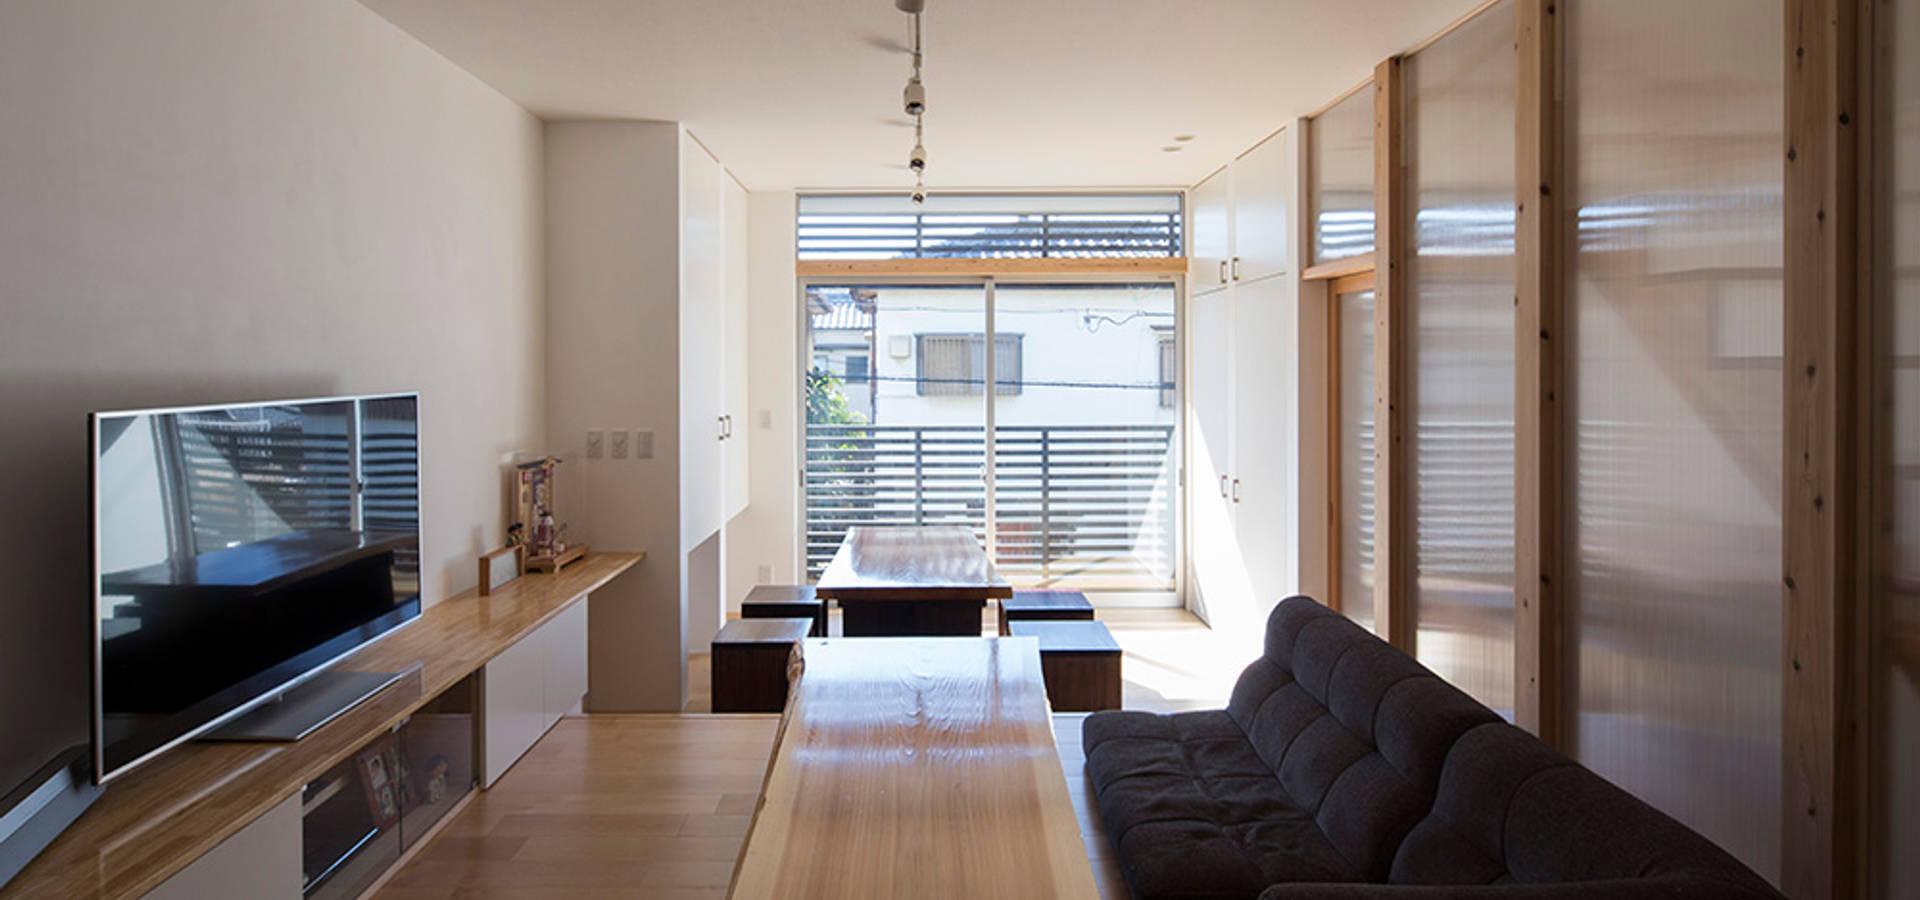 I Live Architects/田辺弘幸建築設計事務所